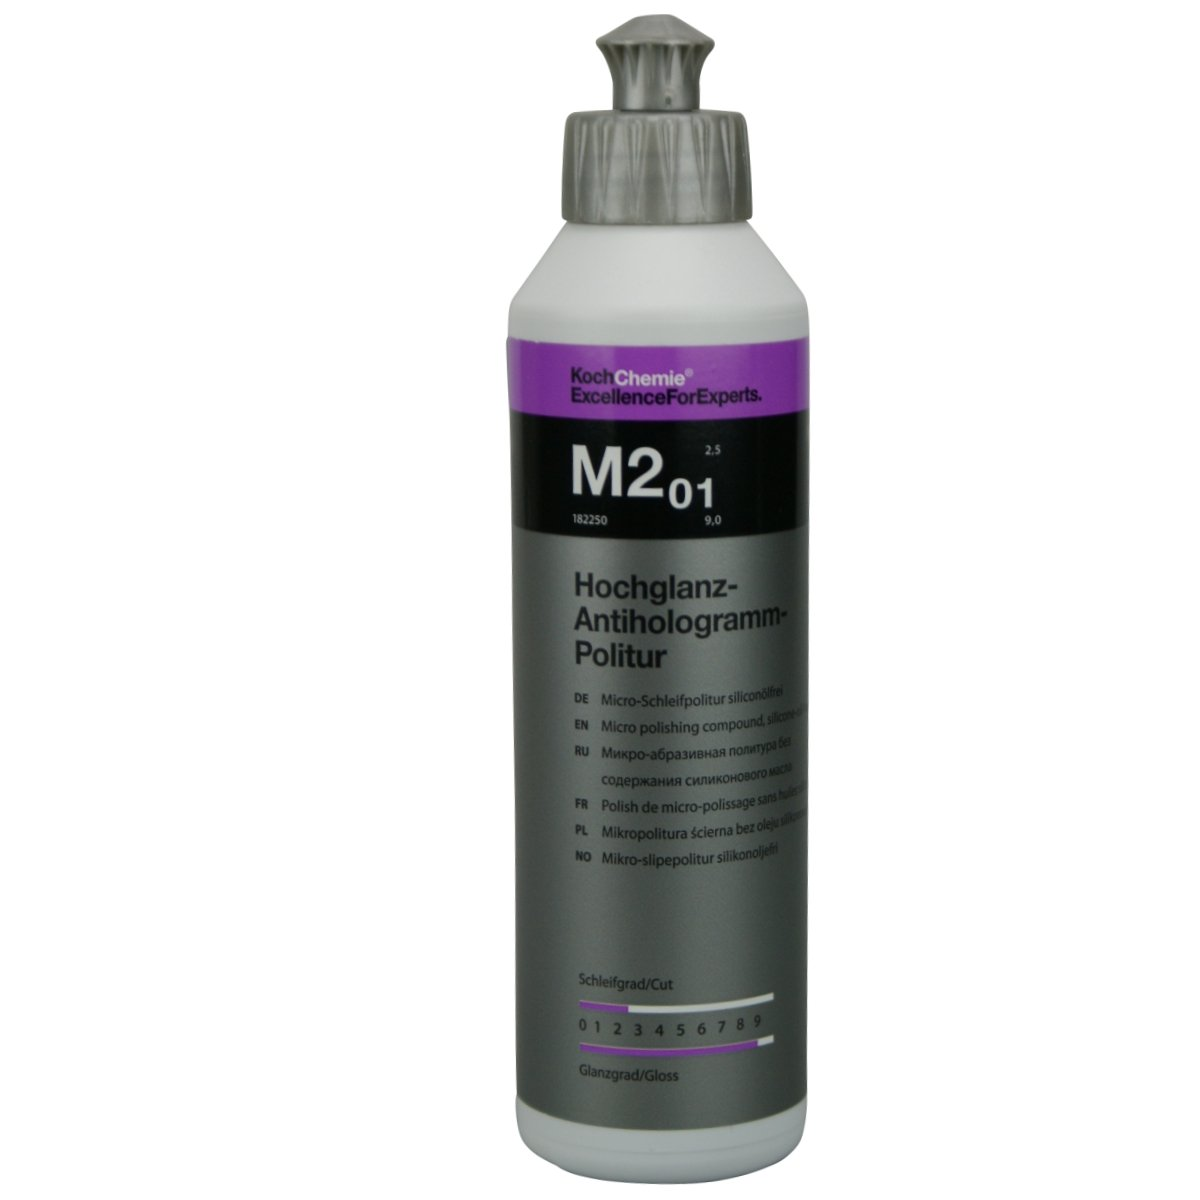 Koch Chemie high gloss anti hologram polish 250 ml